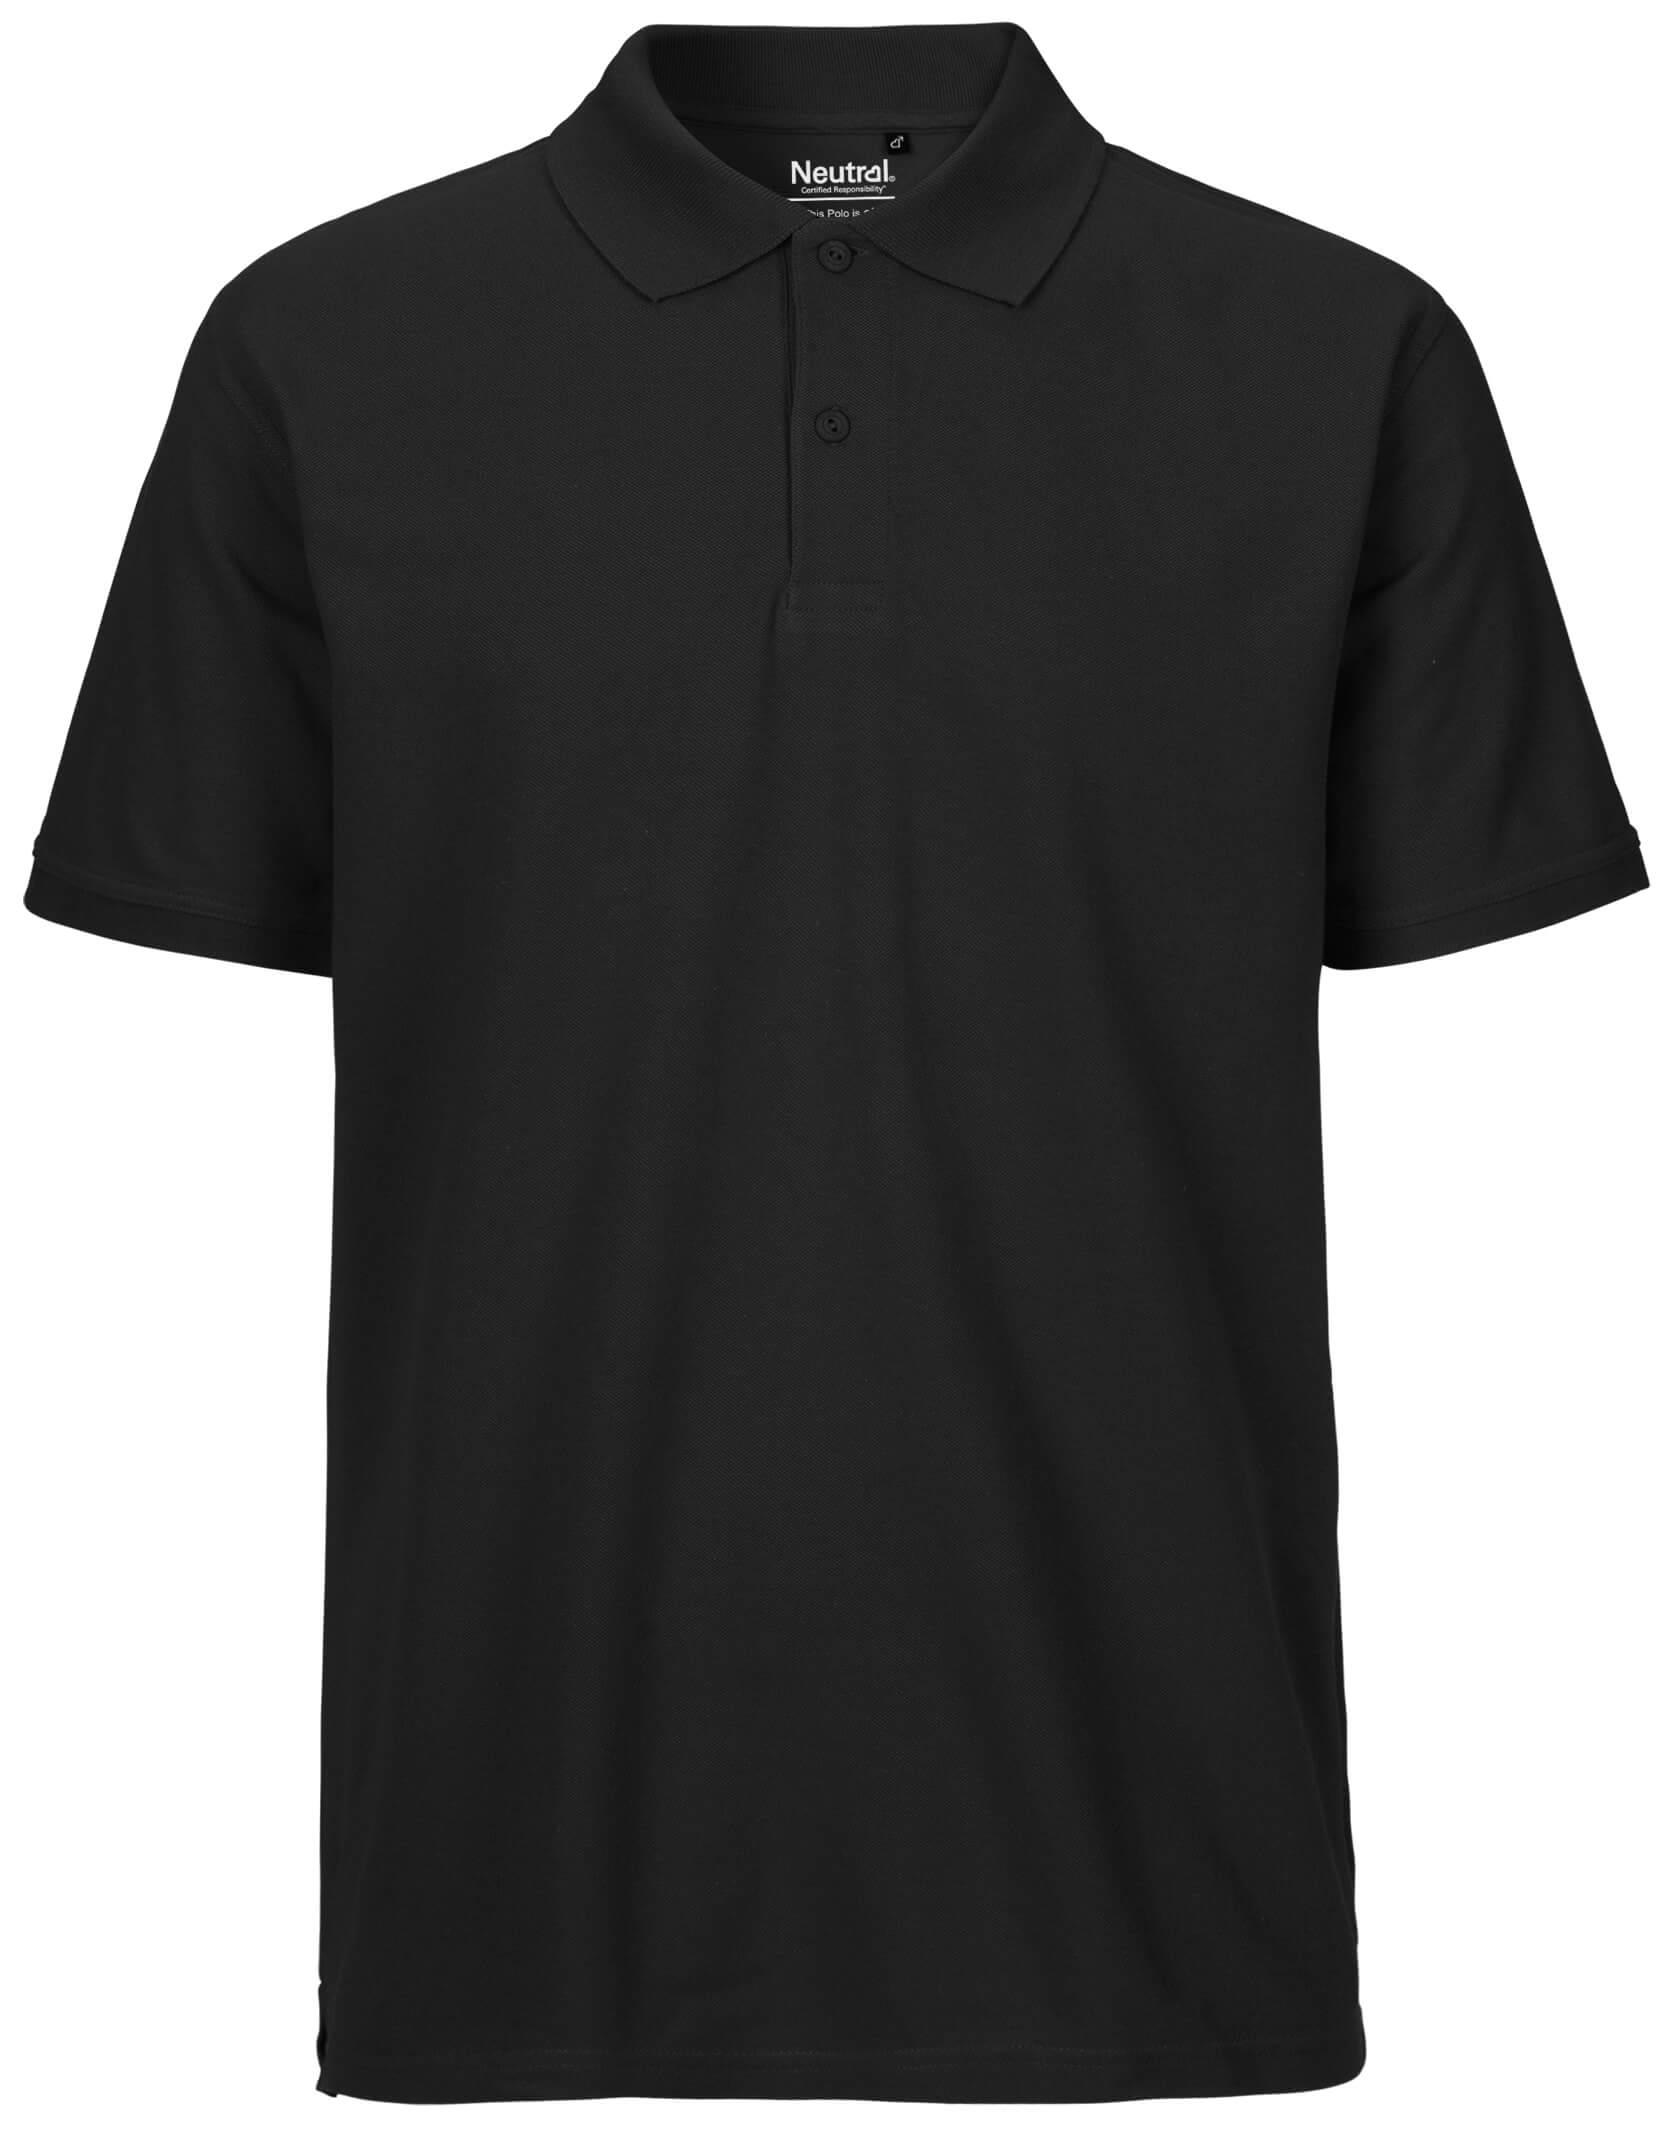 Schwarzes Poloshirt